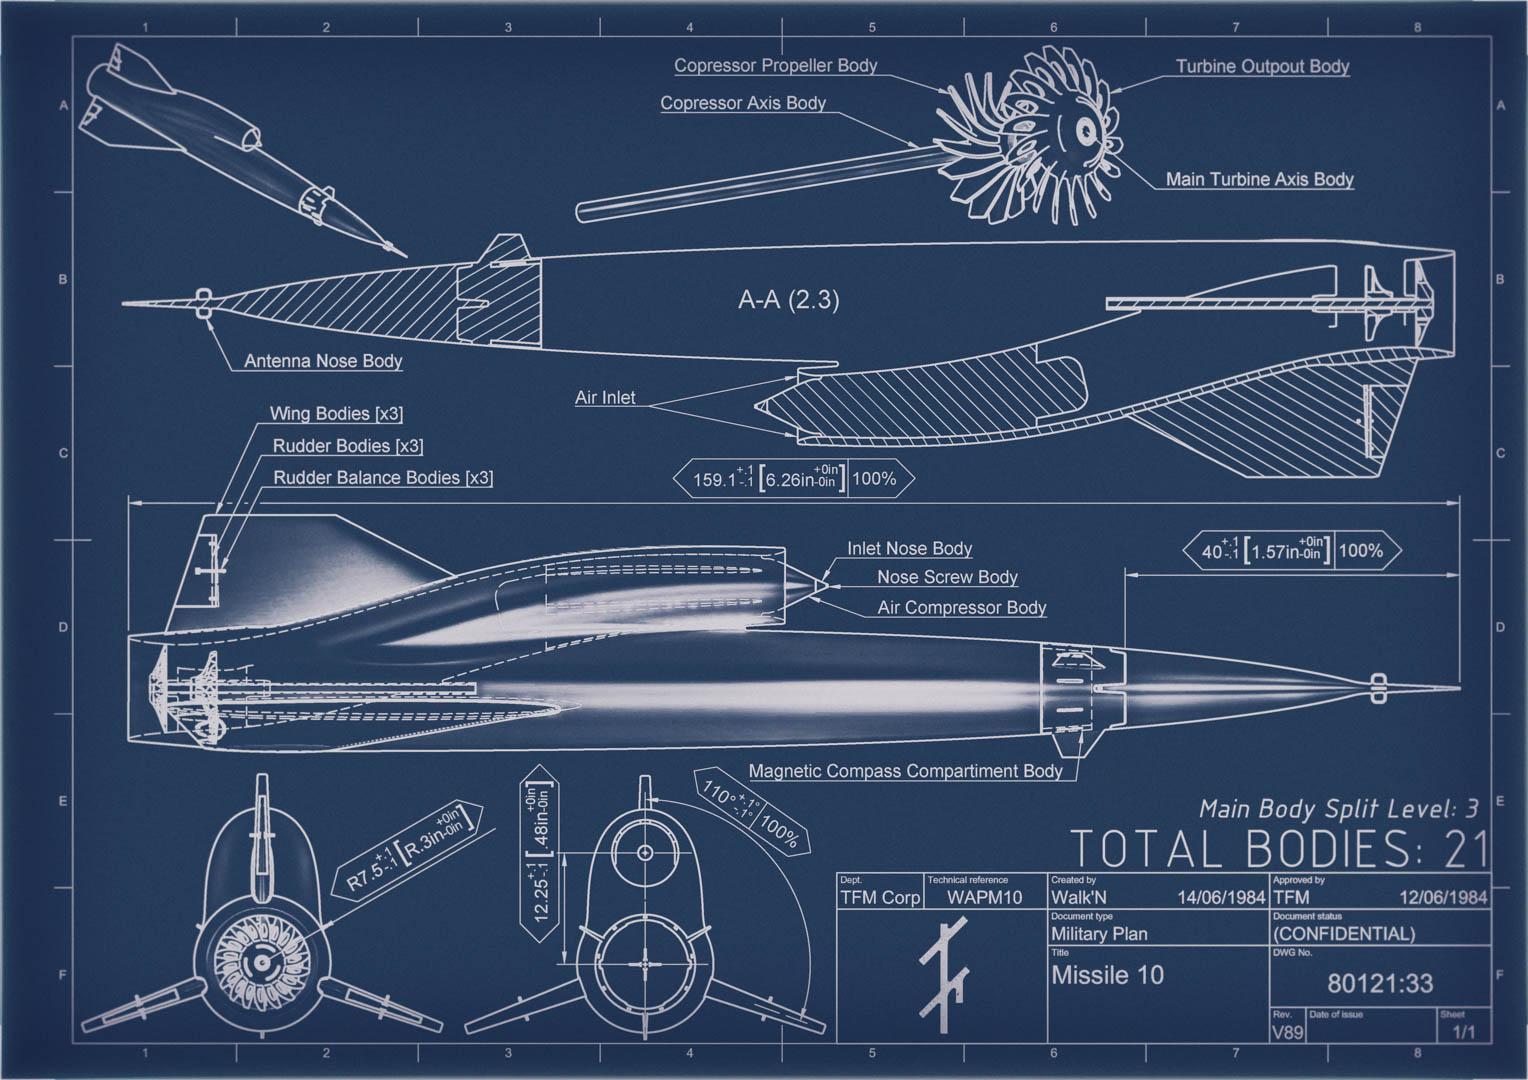 Missile Asset Kit - Missile 11.jpg